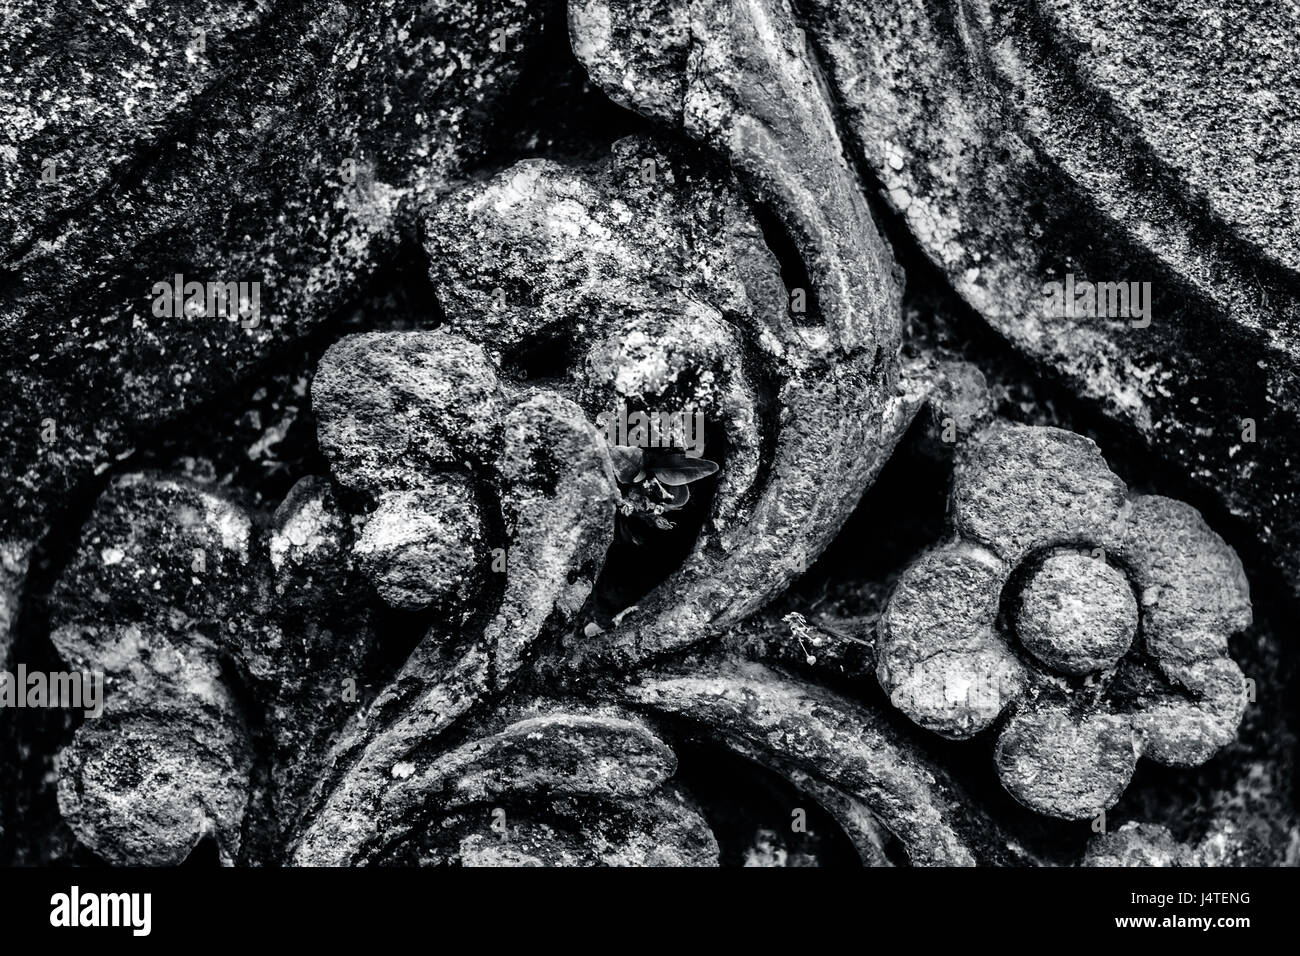 vintage stone curve design as background & texture. - Stock Image